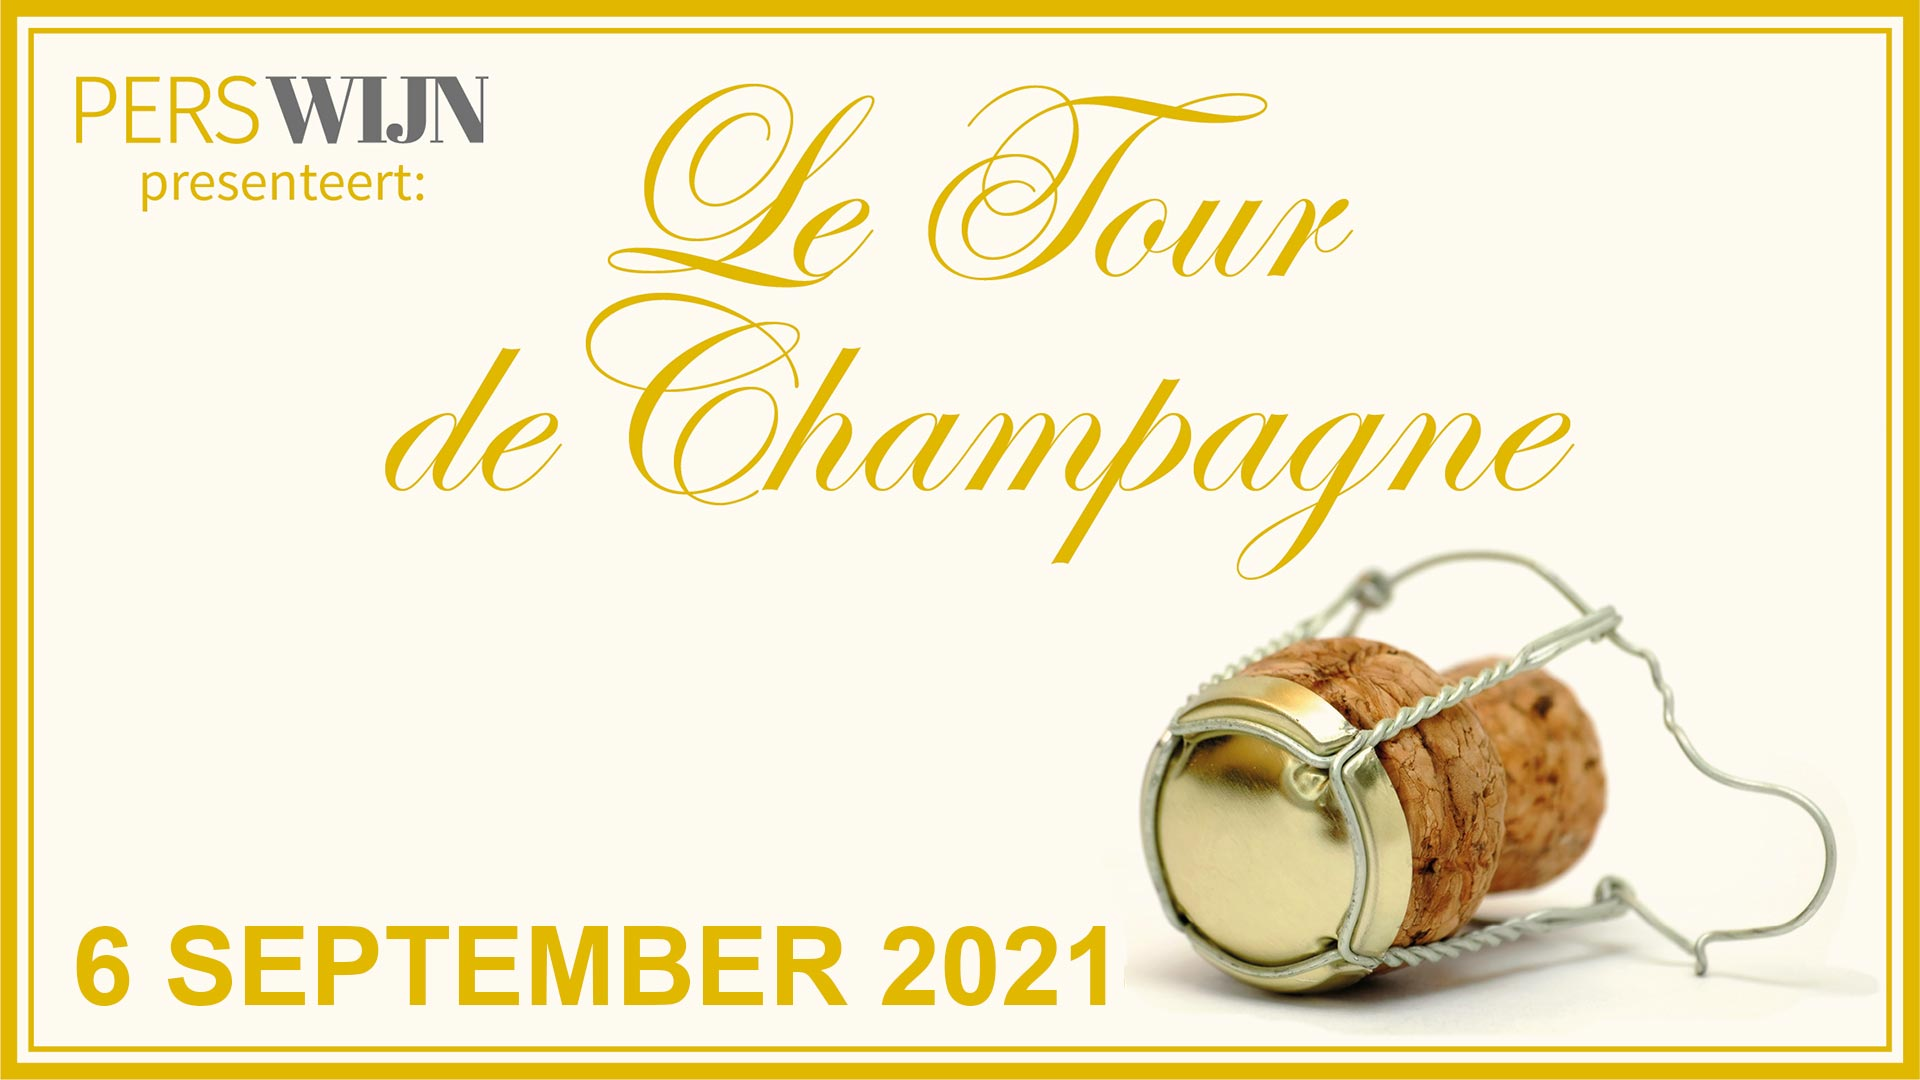 PERSWIJN proeverij Le Tour de Champagne 2021